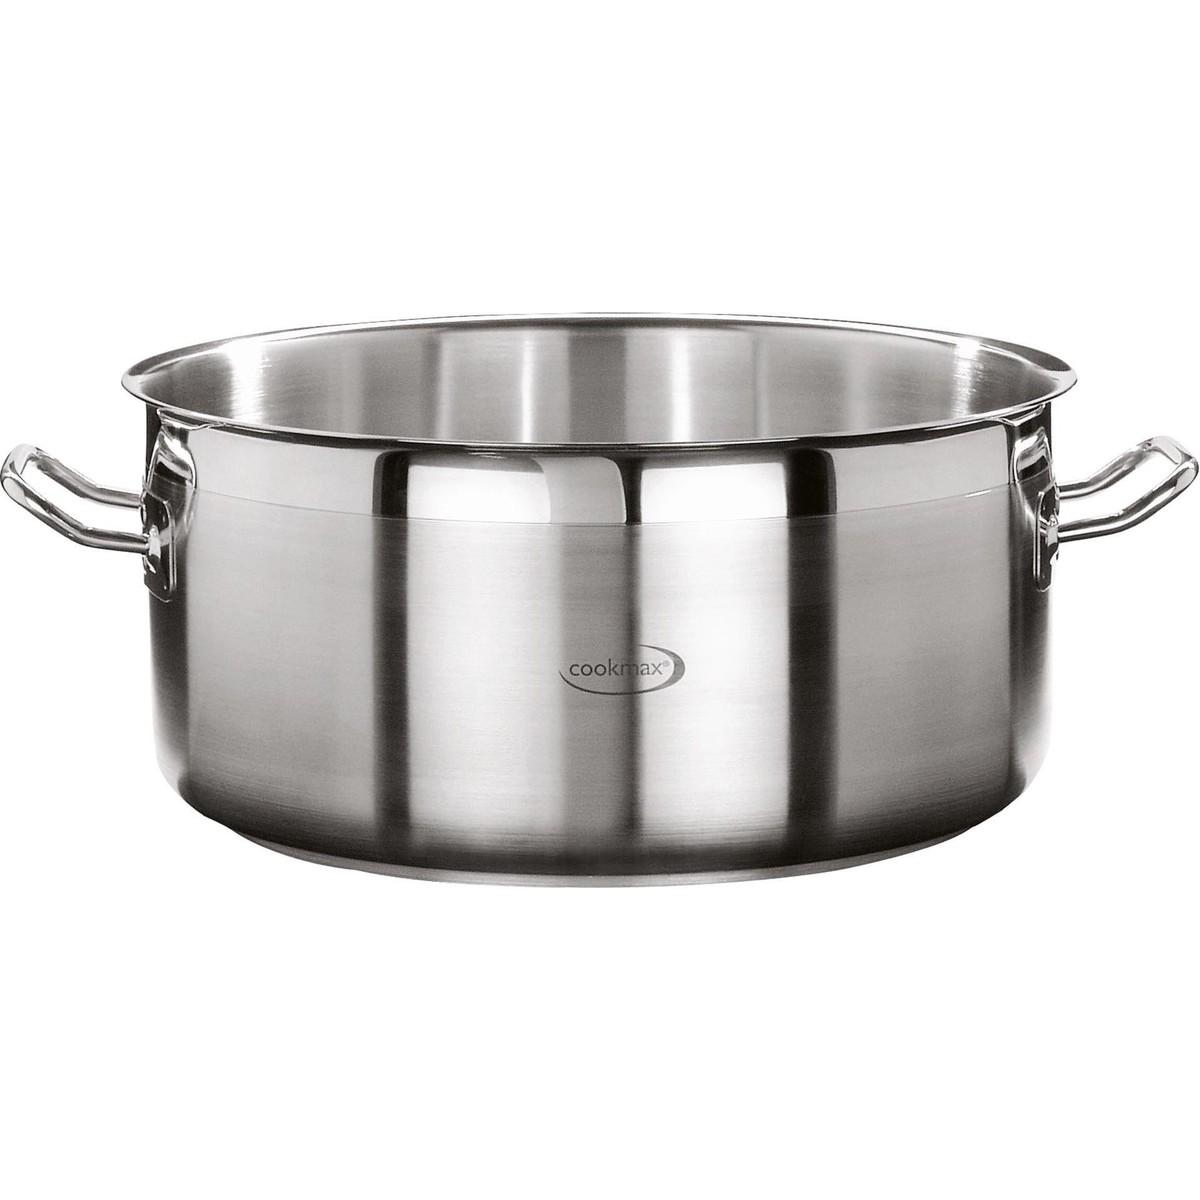 "Bratentopf flach ""Cookmax Professional"" Ø 32 cm, H: 15 cm. Inhalt 12,1L"